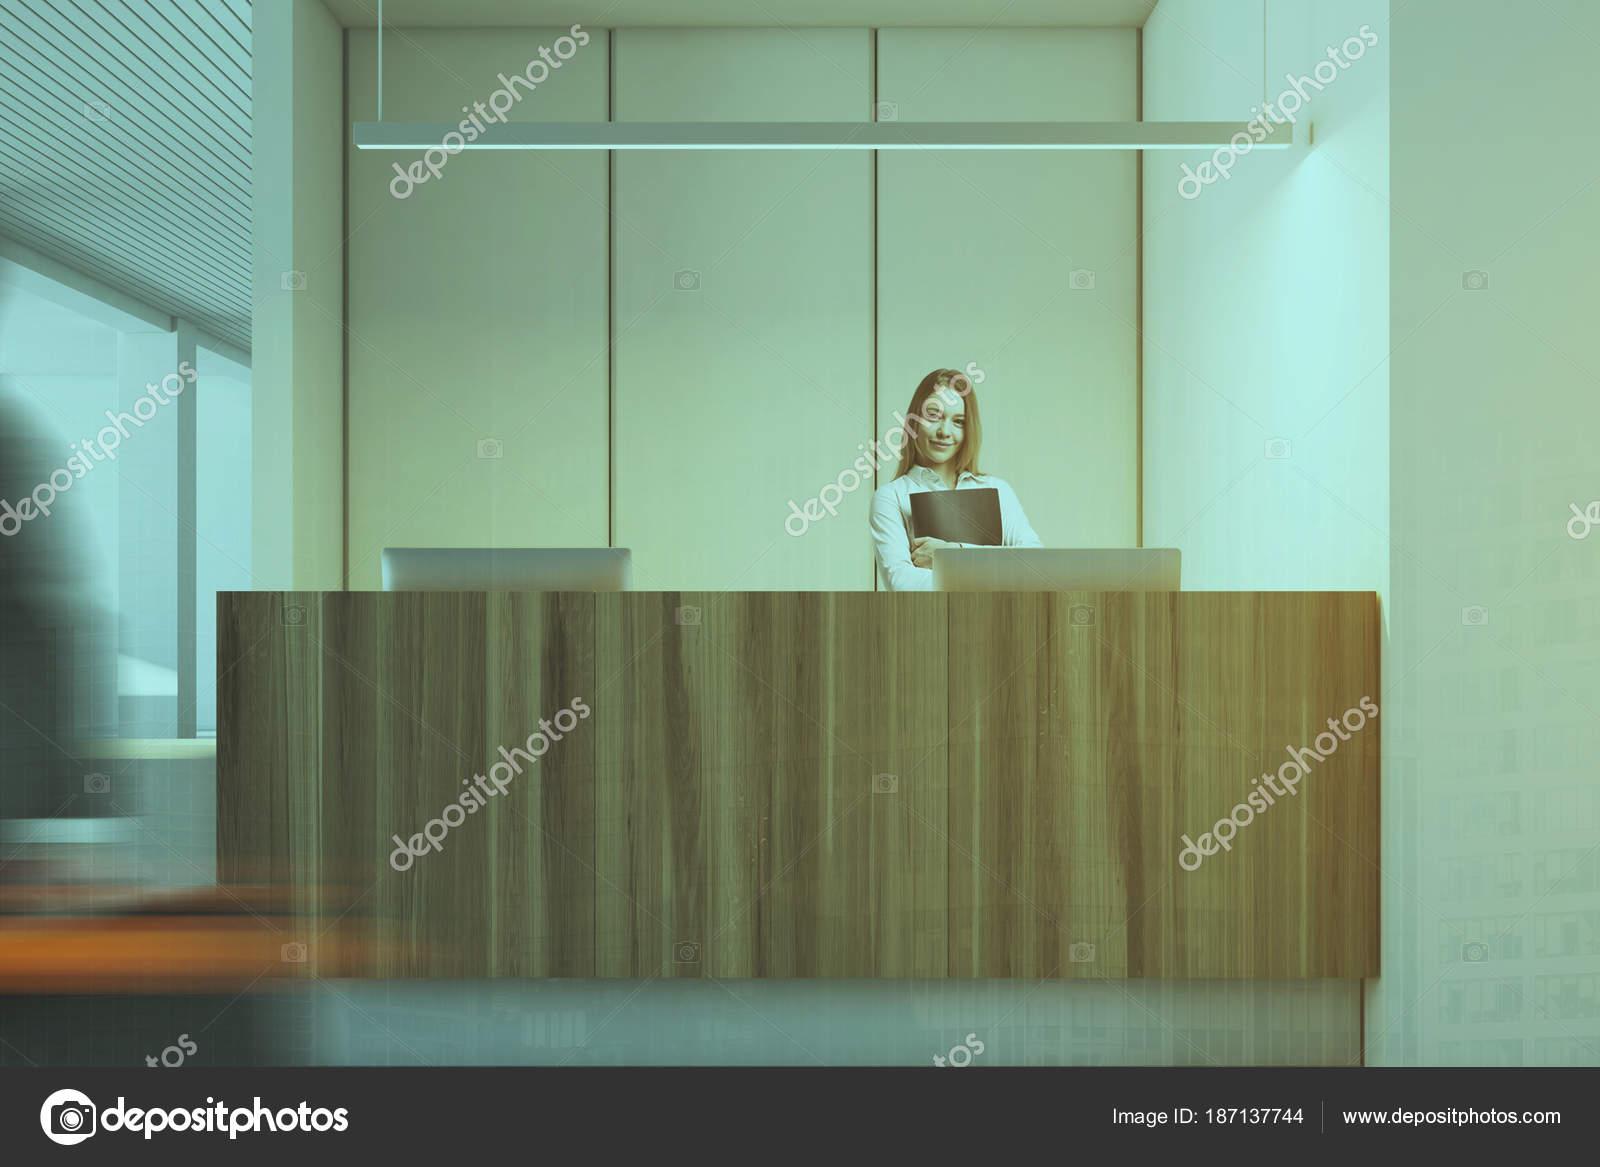 Ufficio Bianco E Legno : Ufficio bianco e legno interno reception donna u foto stock